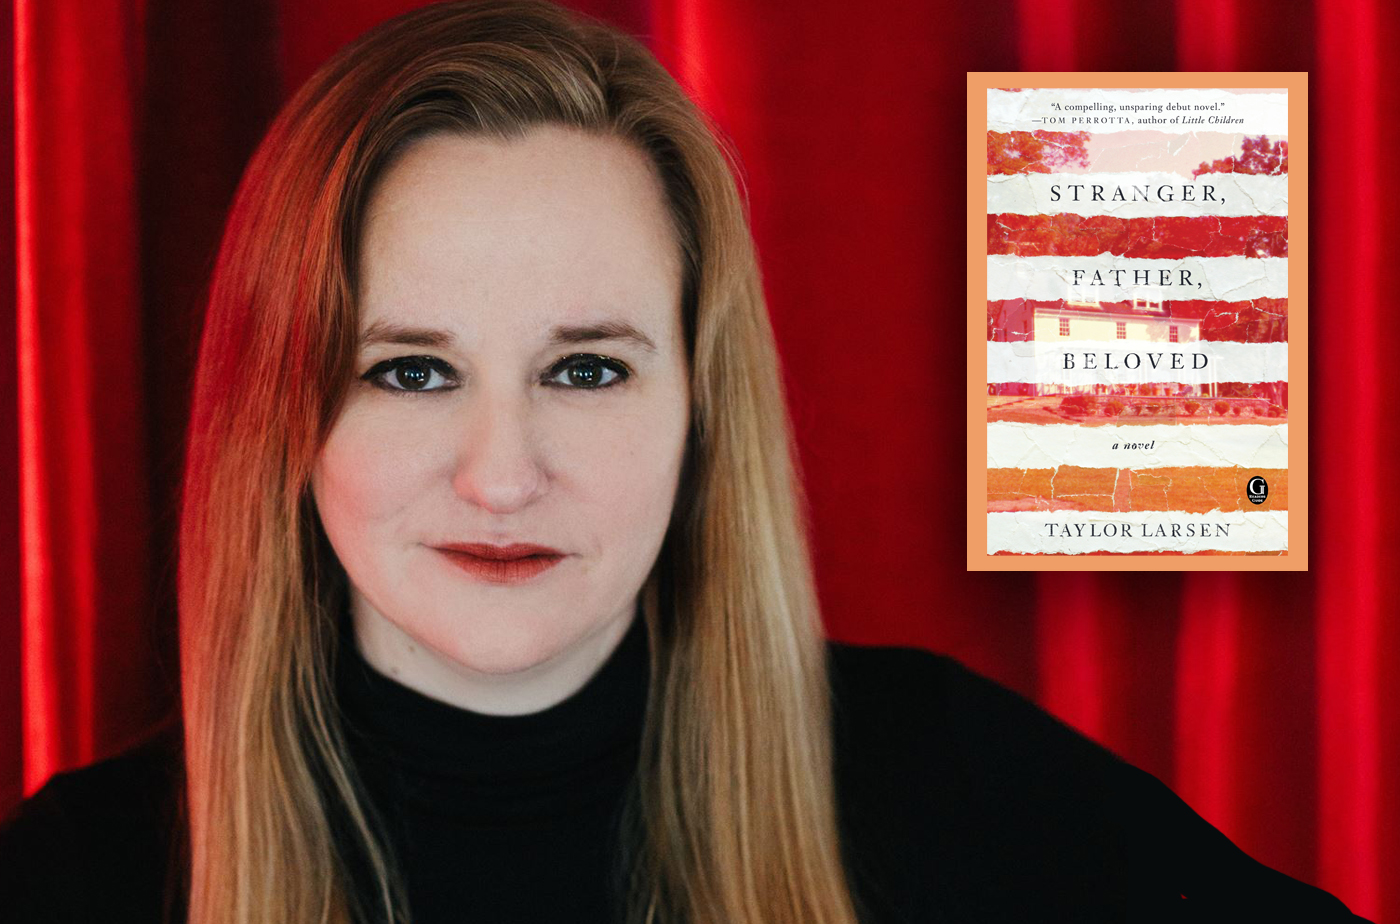 Catapult online classes: Taylor Larsen, 12-Week Online Novel Draft Generator, Novel, Fiction, Workshop